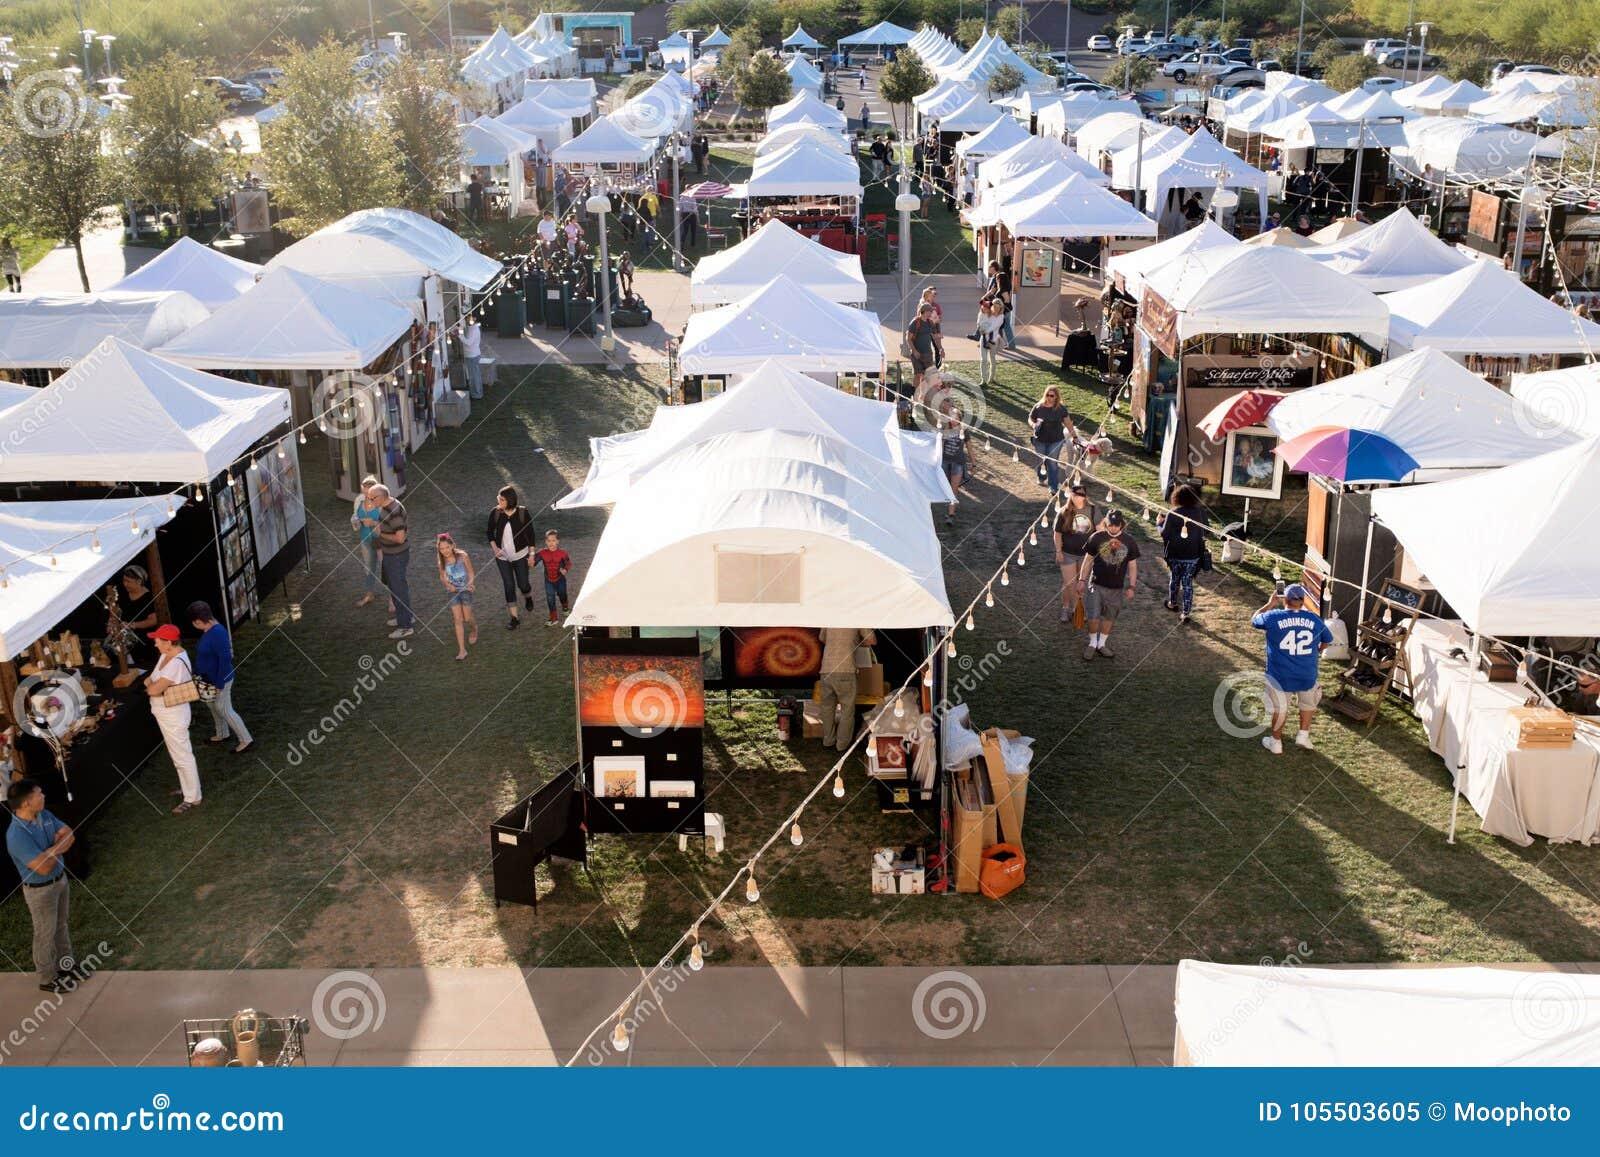 Art Festival In Downtown Summerlin, Las Vegas, NV Editorial Image